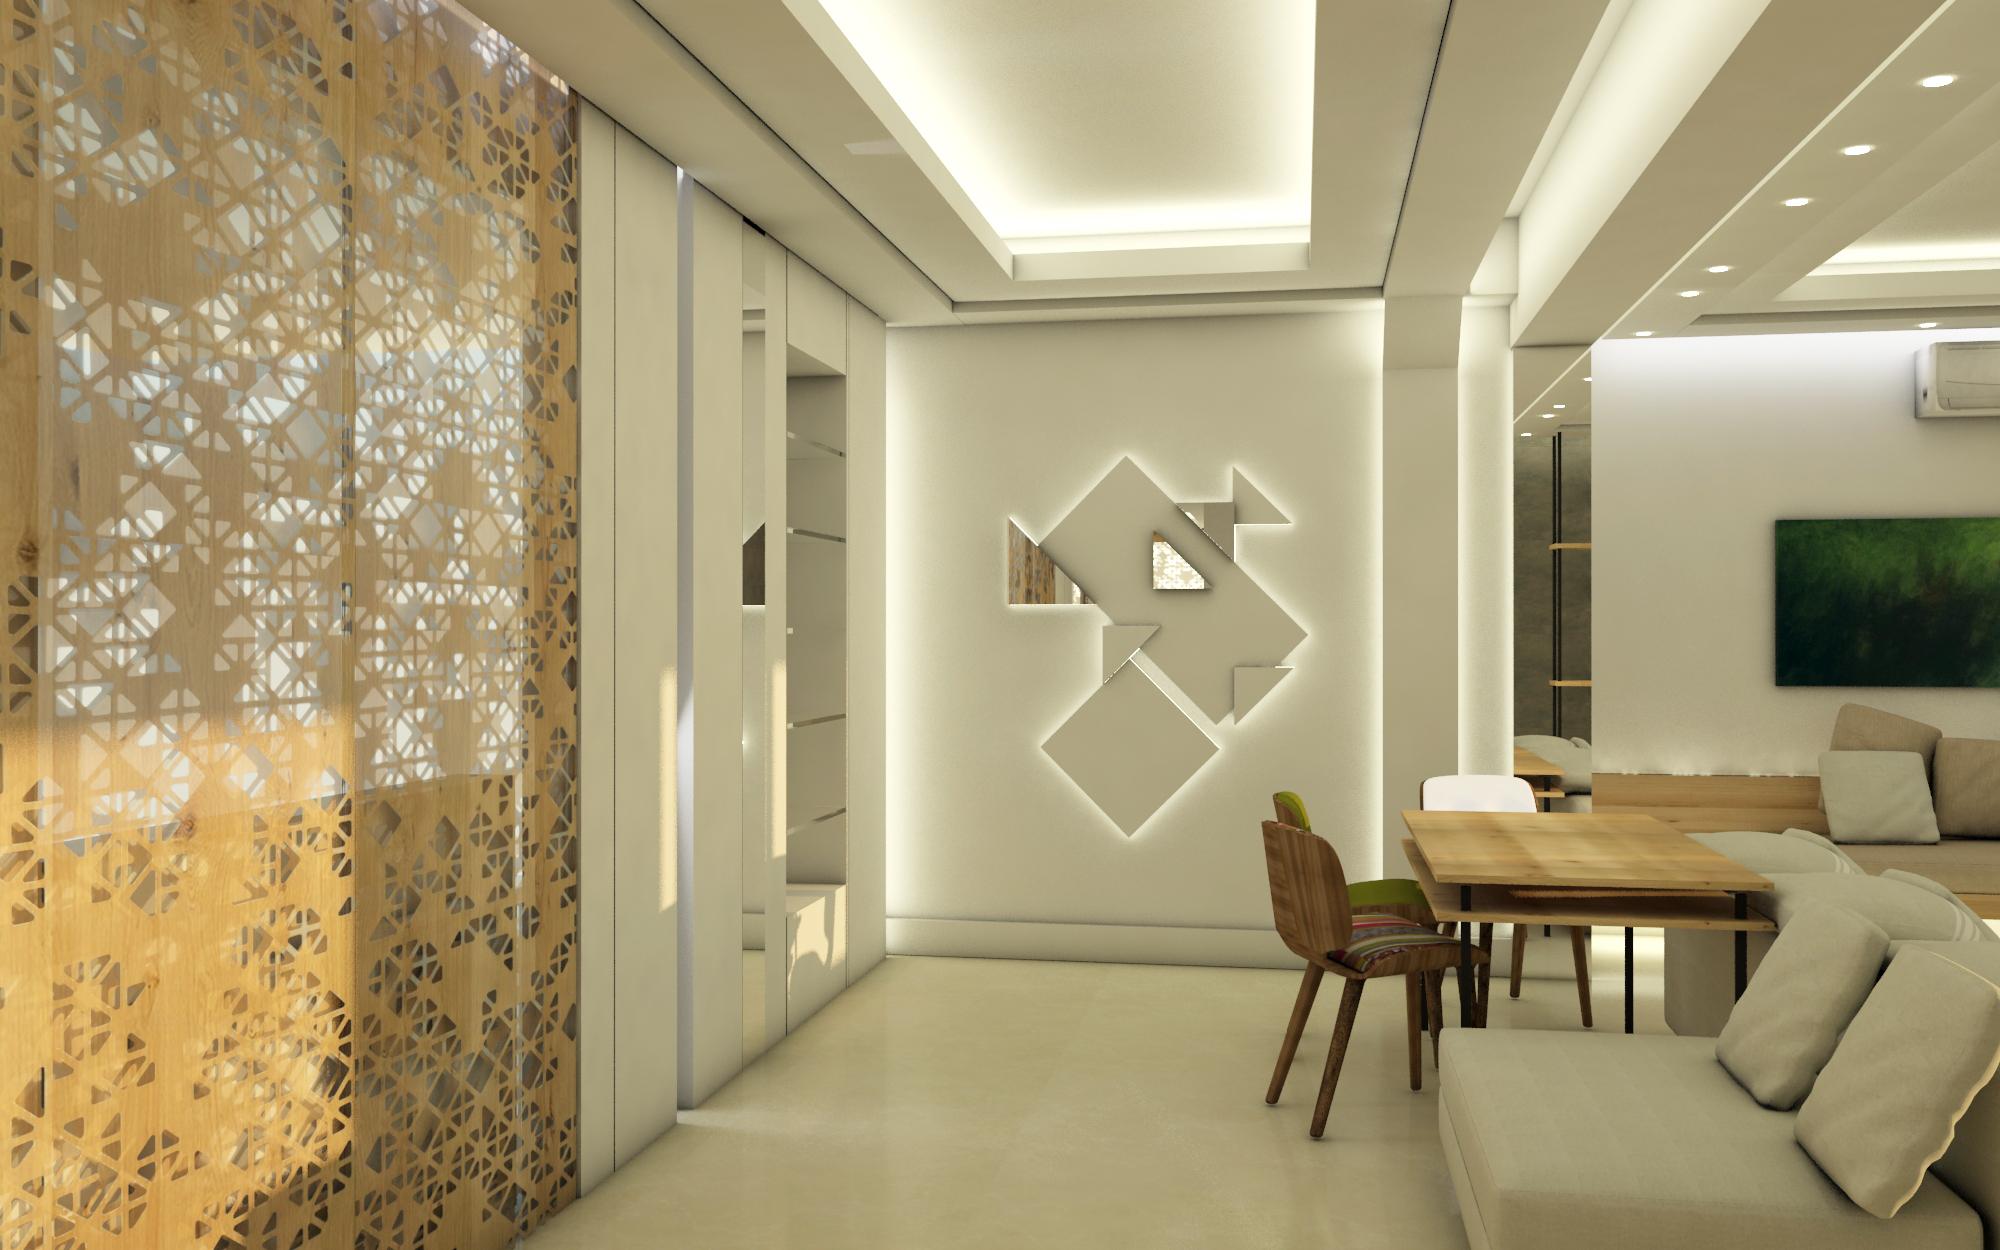 Online Interior Design By Moodfit